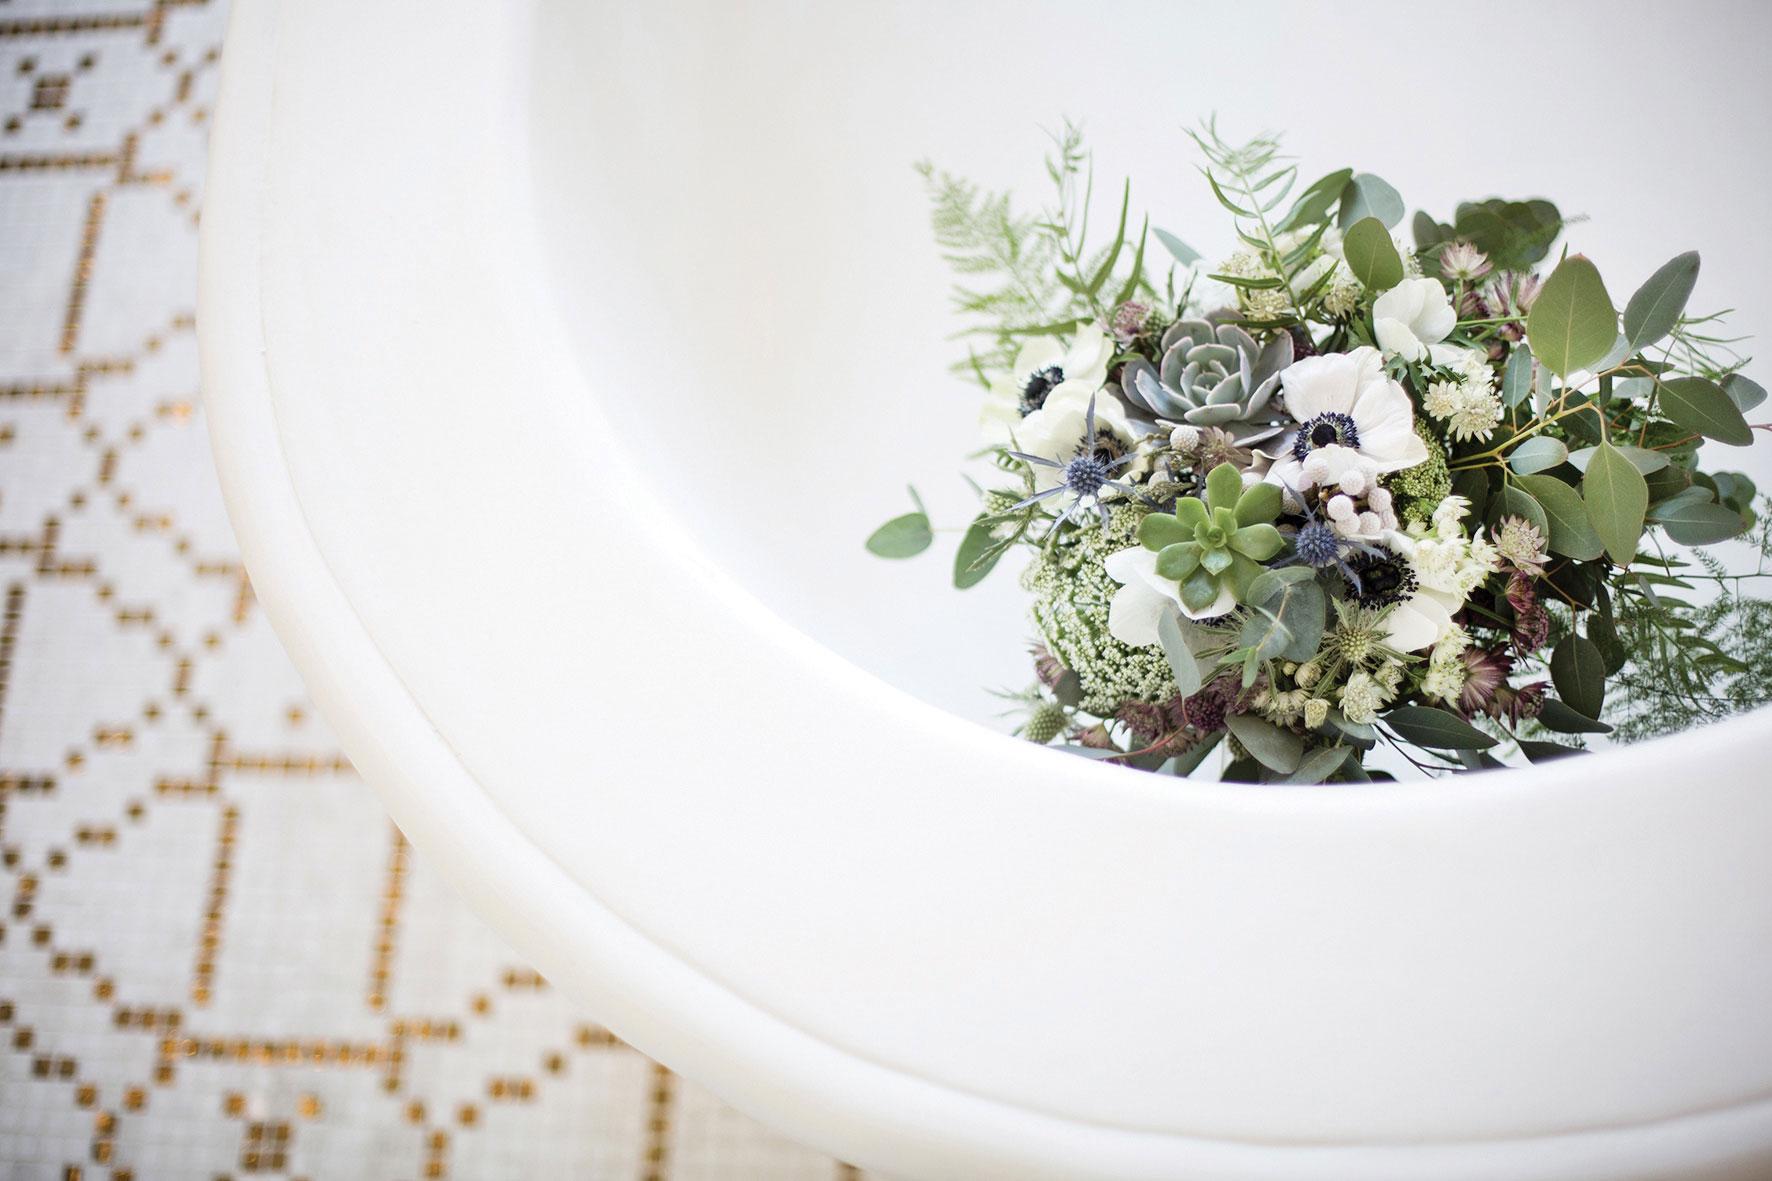 Ramo de novia elegante a medida diferente invierno